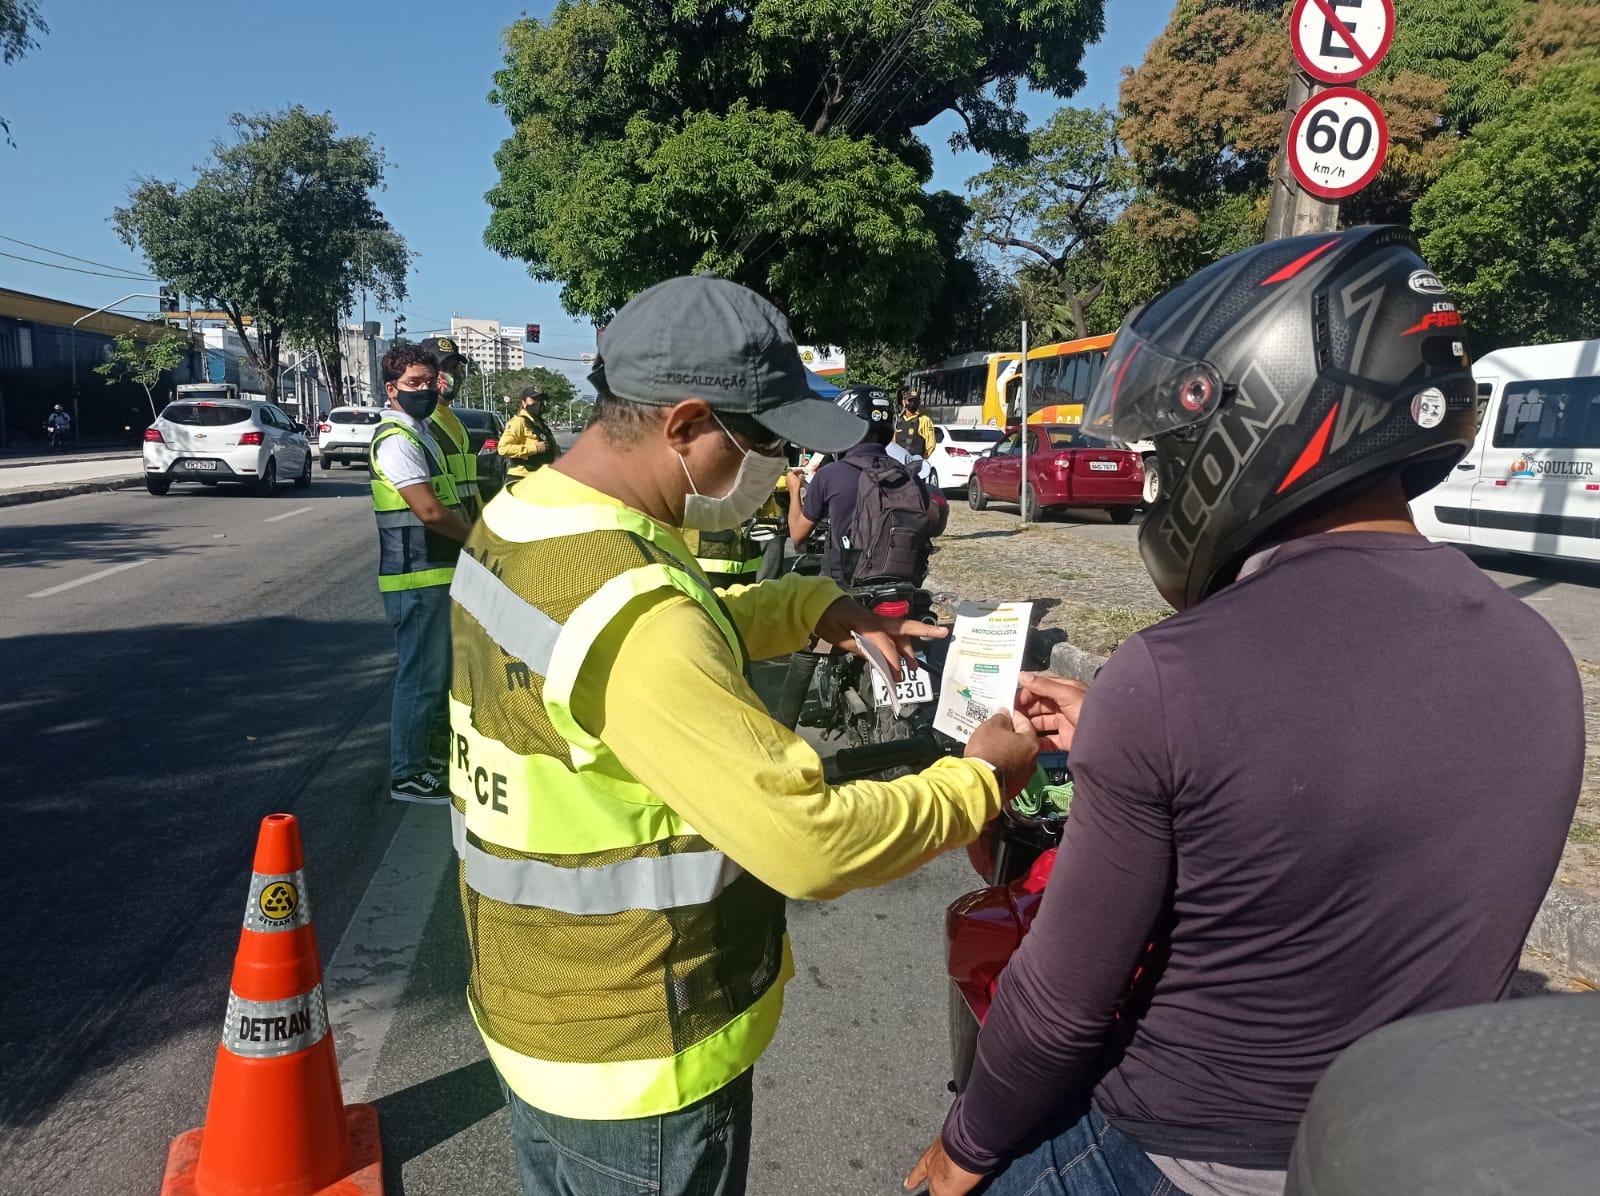 Detran-CE realiza blitz educativa na Avenida Godofredo Maciel para celebrar o Dia do Motociclista